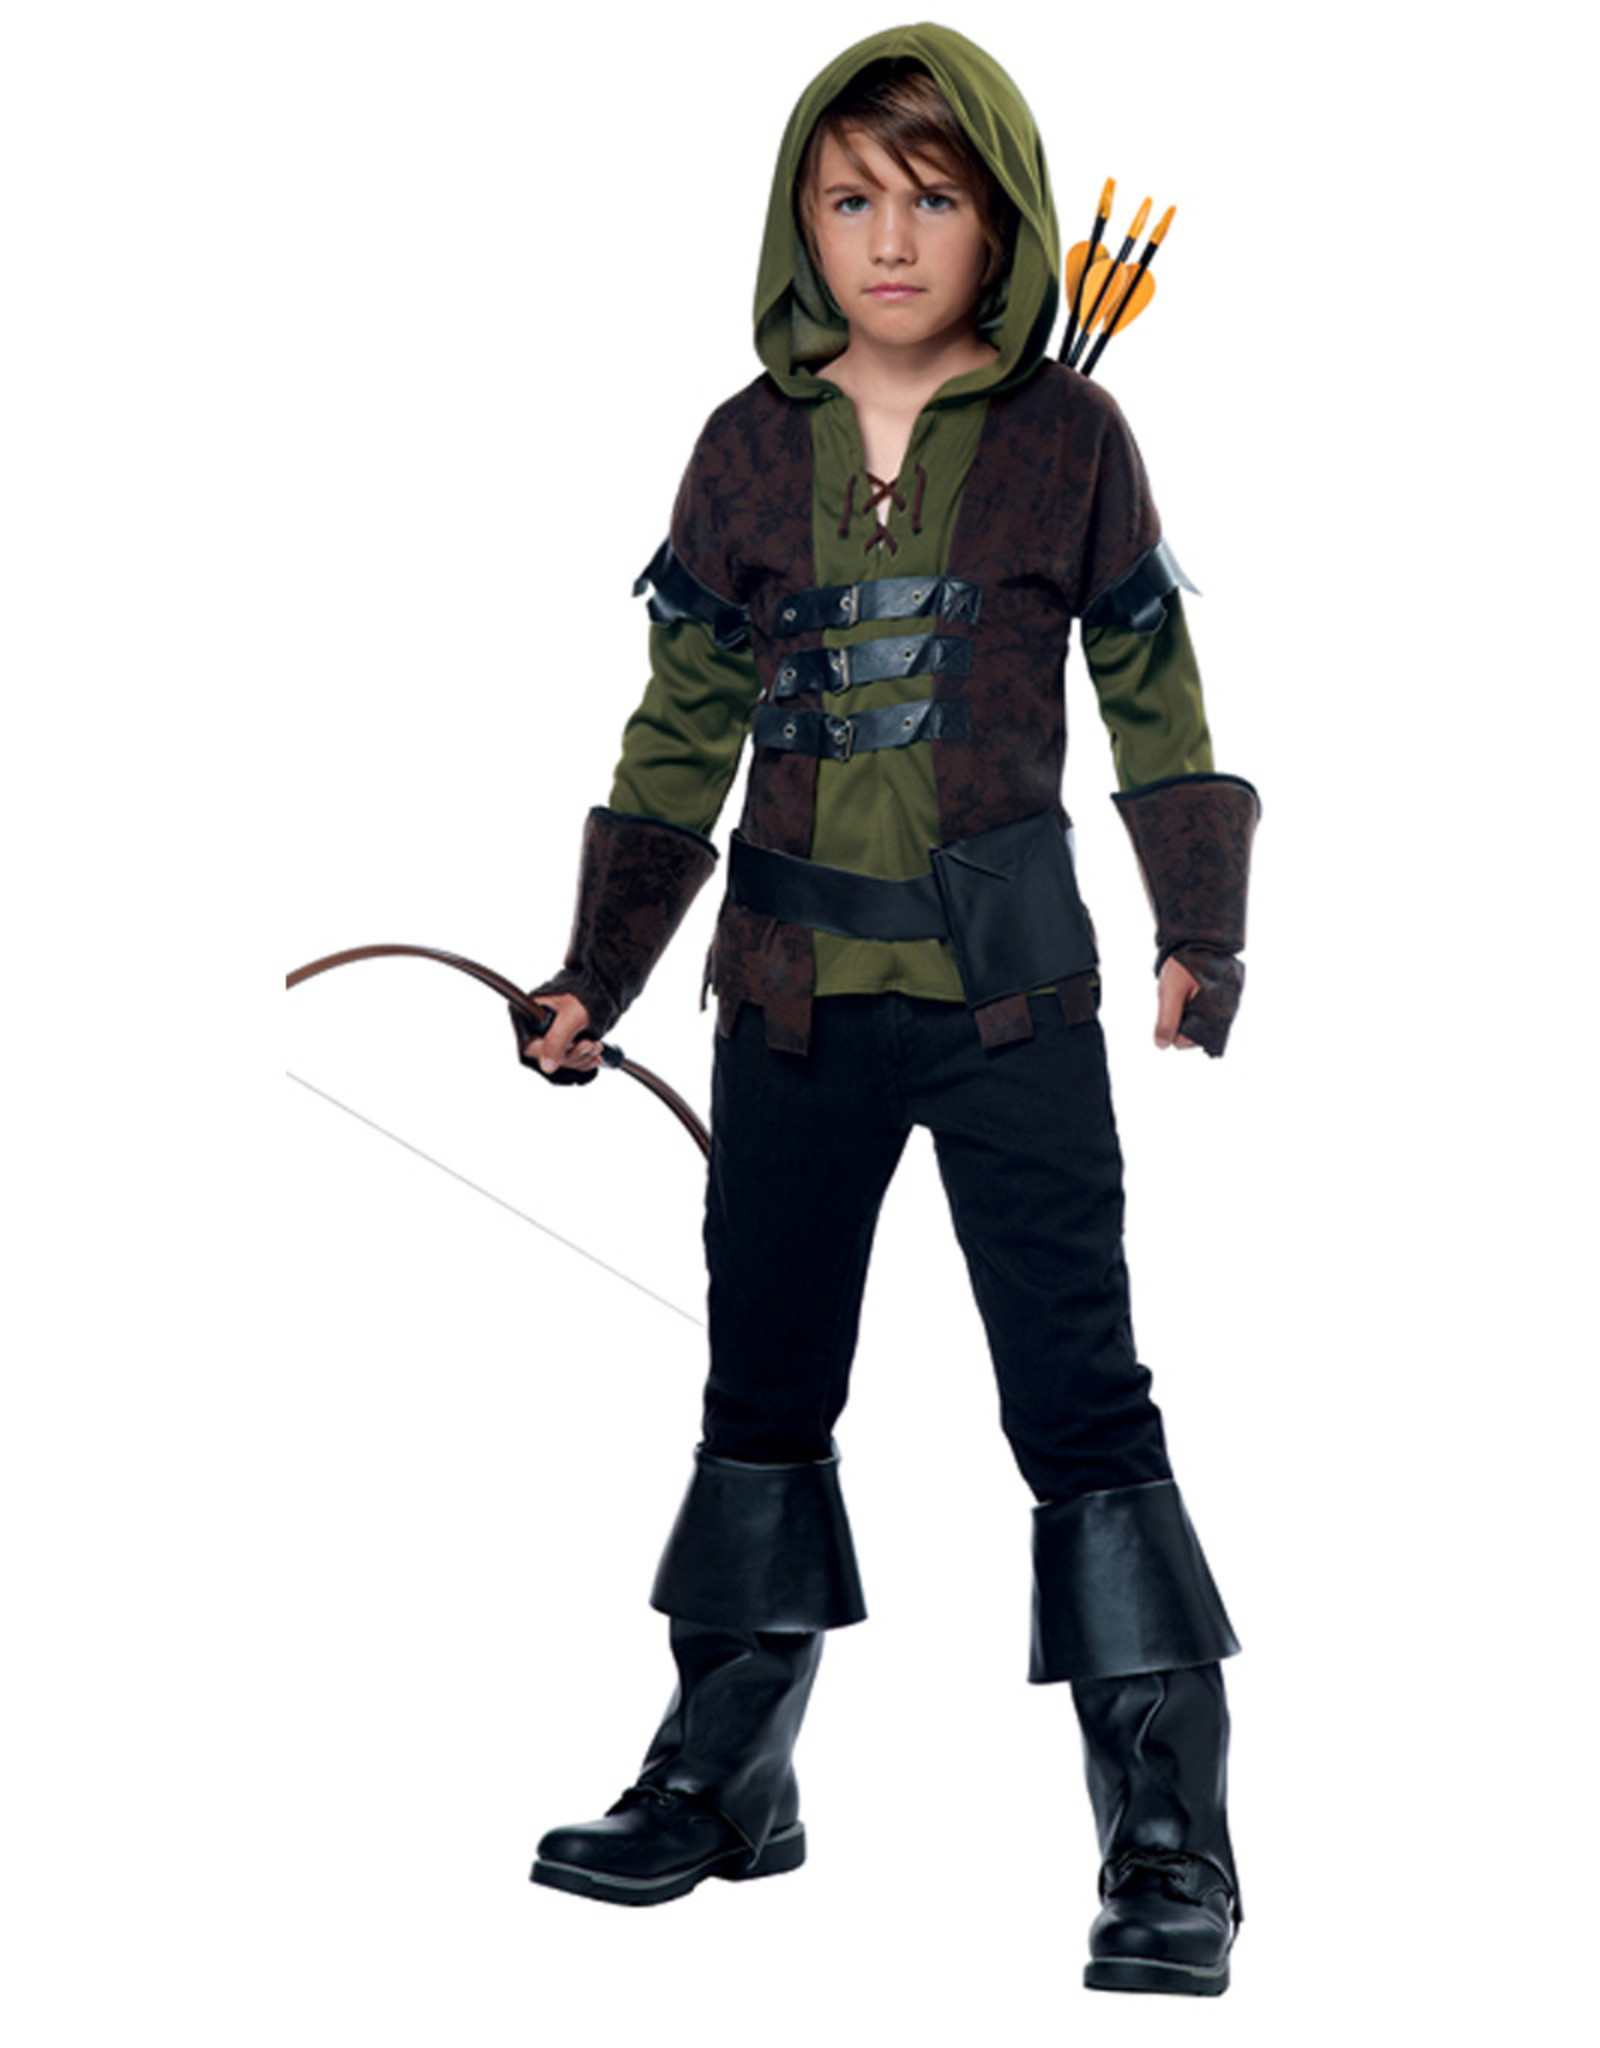 Robin Hood Costume - Boys